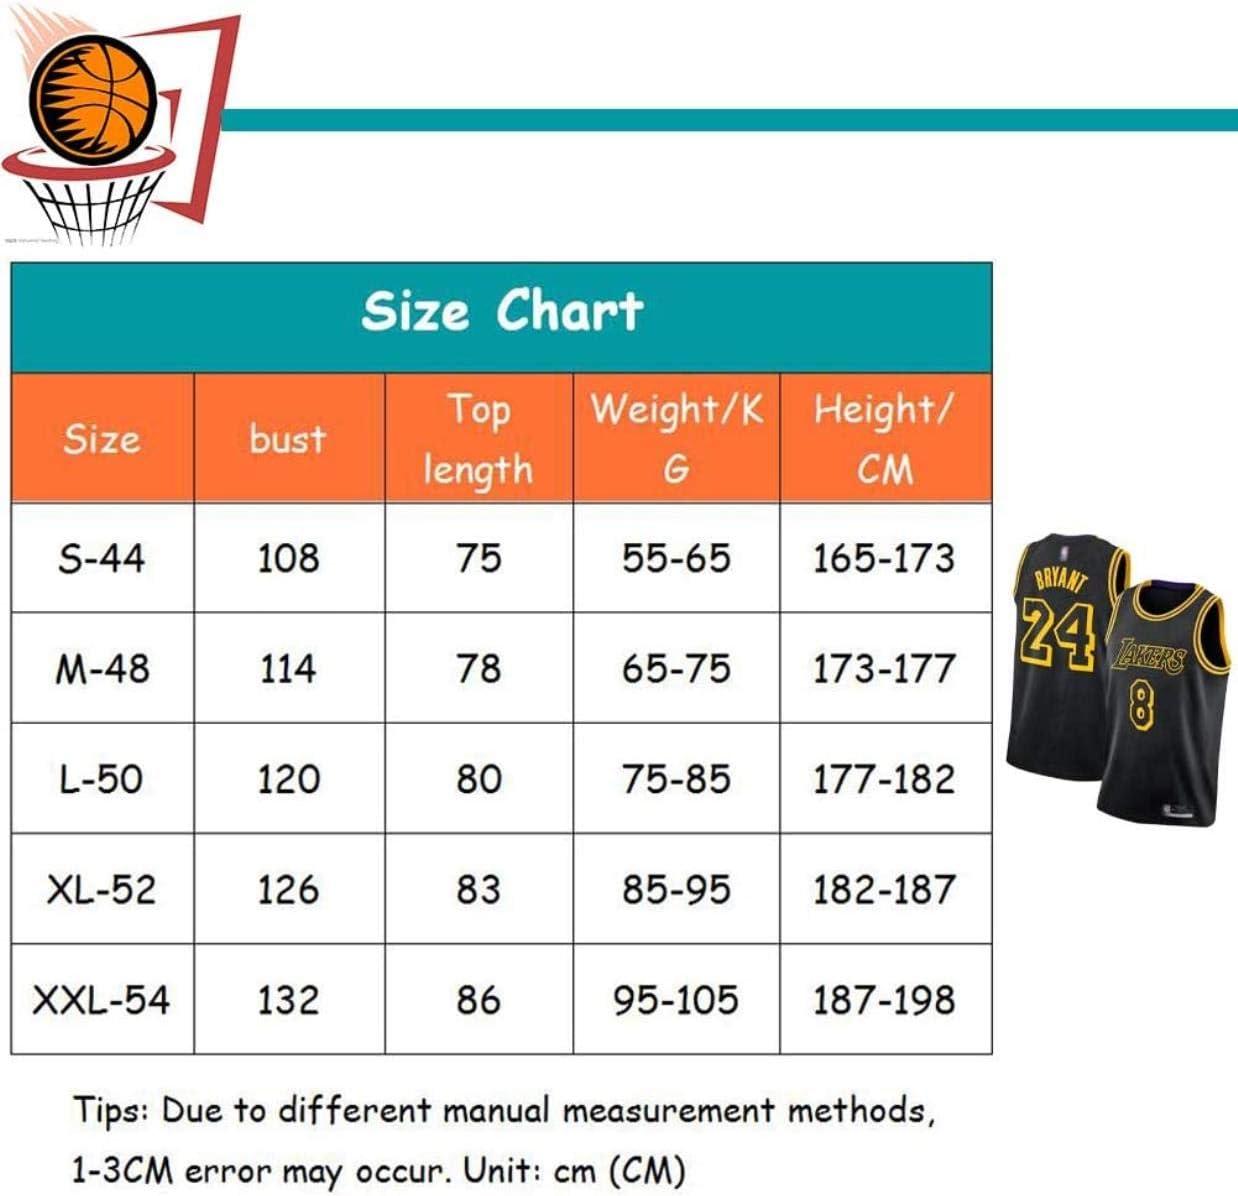 gaojian Bryant # 24 # 8 Special Edition Basketball Jersey Black Mamba Memorial Basketball Uniform Swingman Sportswear Breathable Comfortable Sweatshirt.-XL,Small